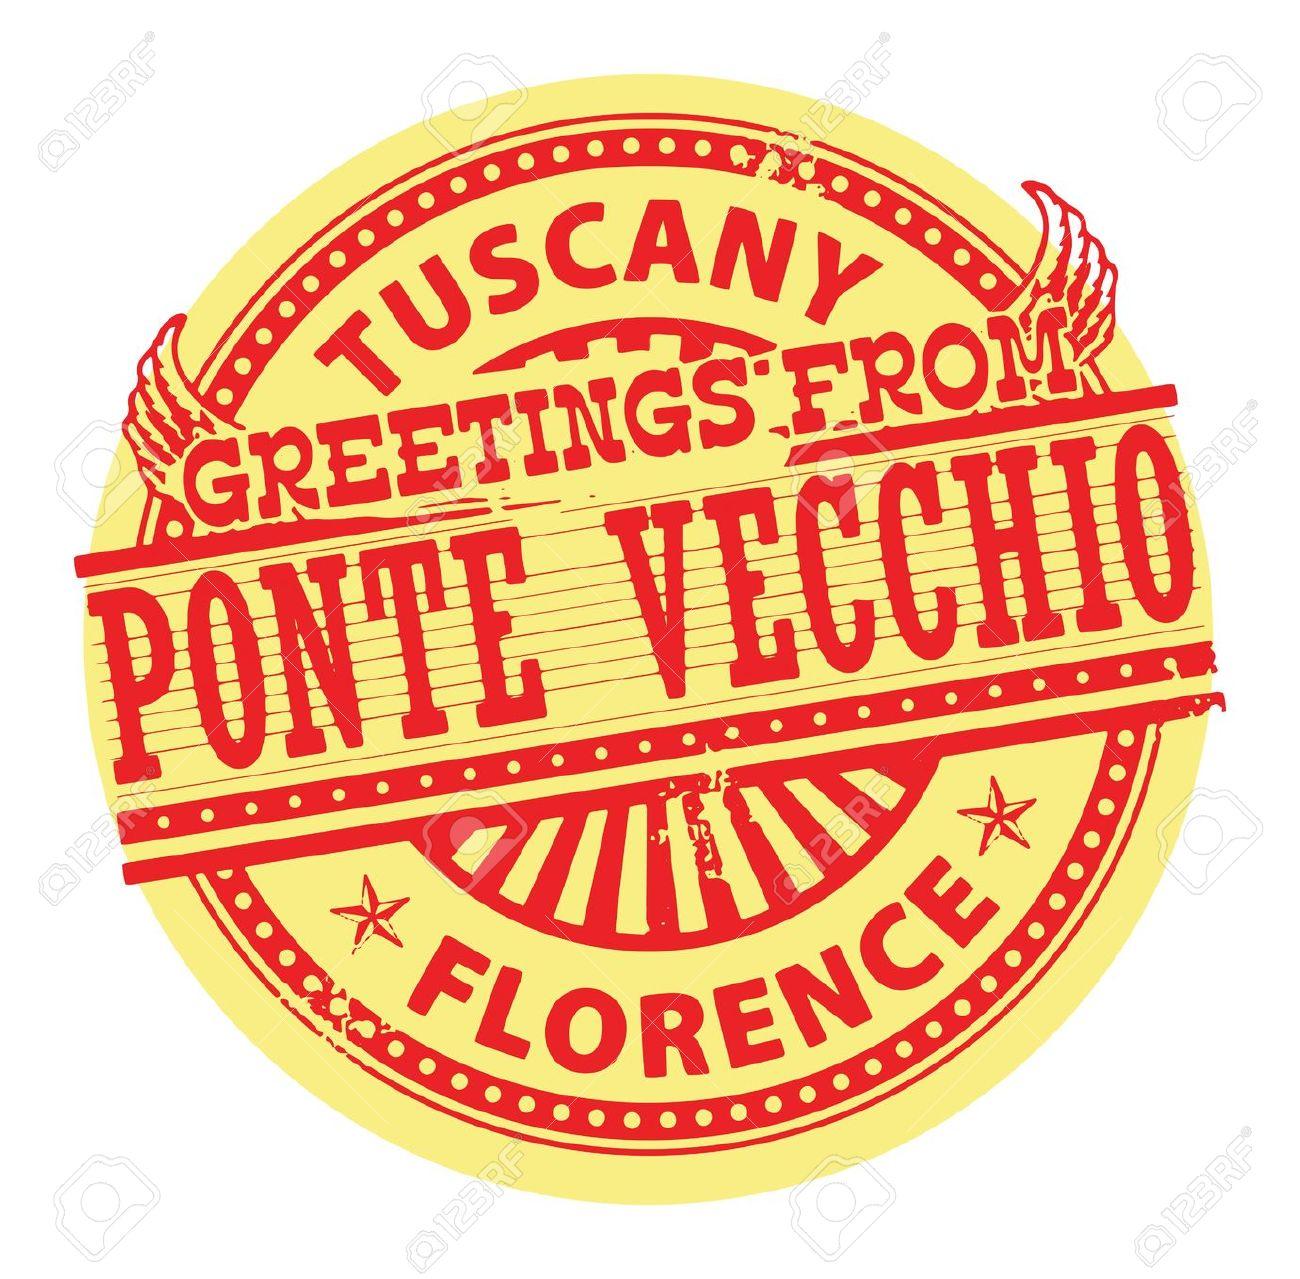 Vecchio Stock Illustrations, Cliparts And Royalty Free Vecchio Vectors.